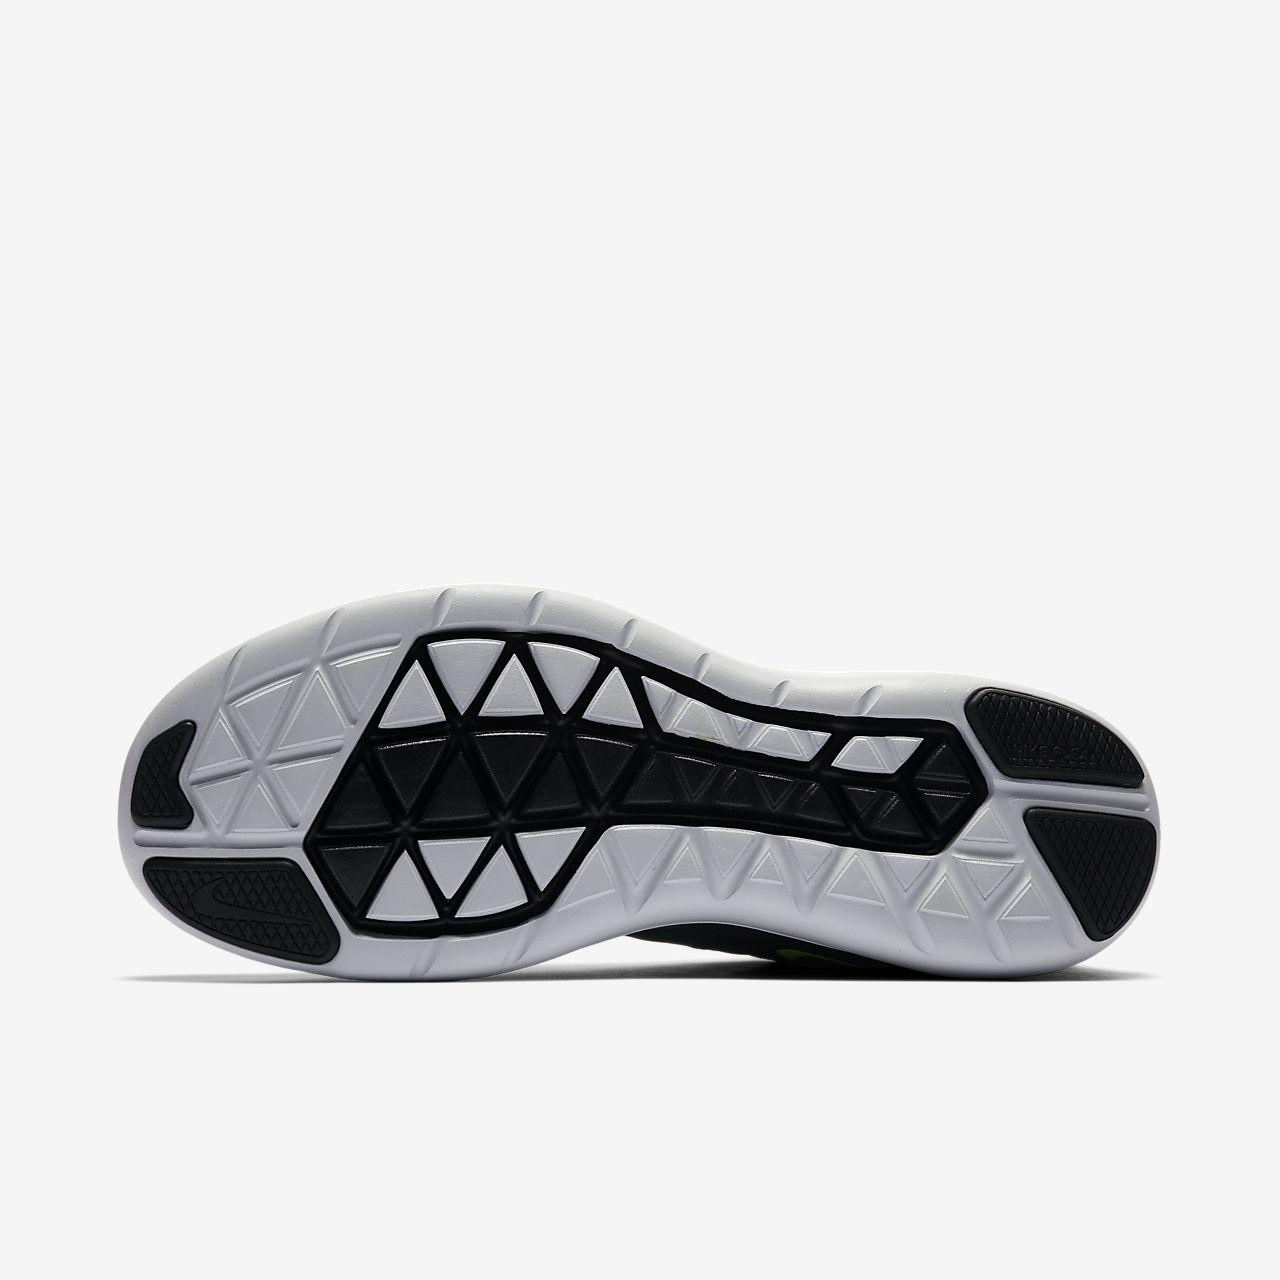 Scarpe Nike Calzano Scarpe Strette Strette Scarpe Nike Calzano Nike TxpZ66wqE